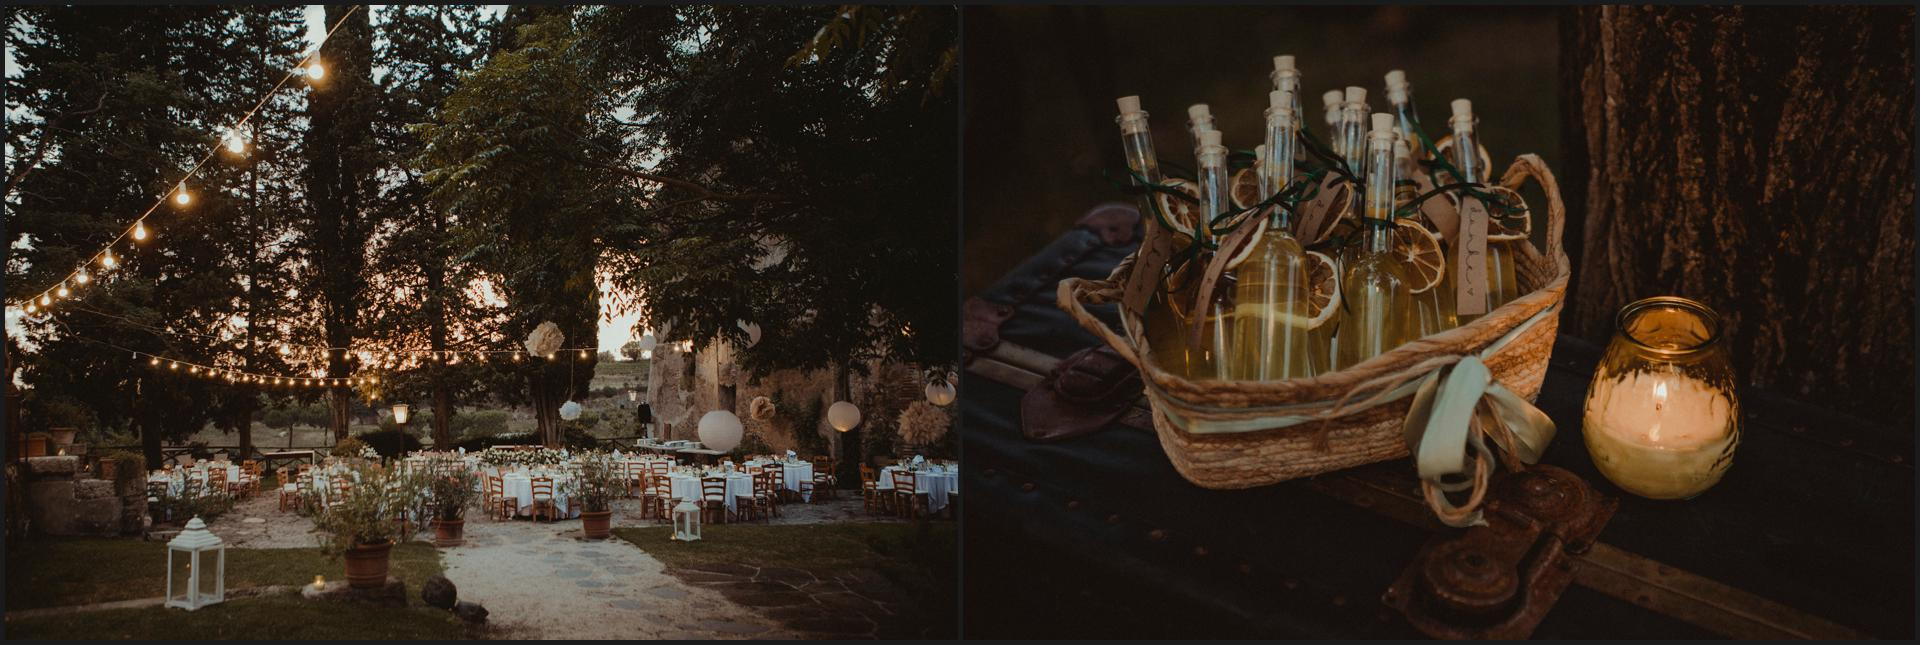 borgo di tragliata, wedding, rome, wedding in rome, wedding reception